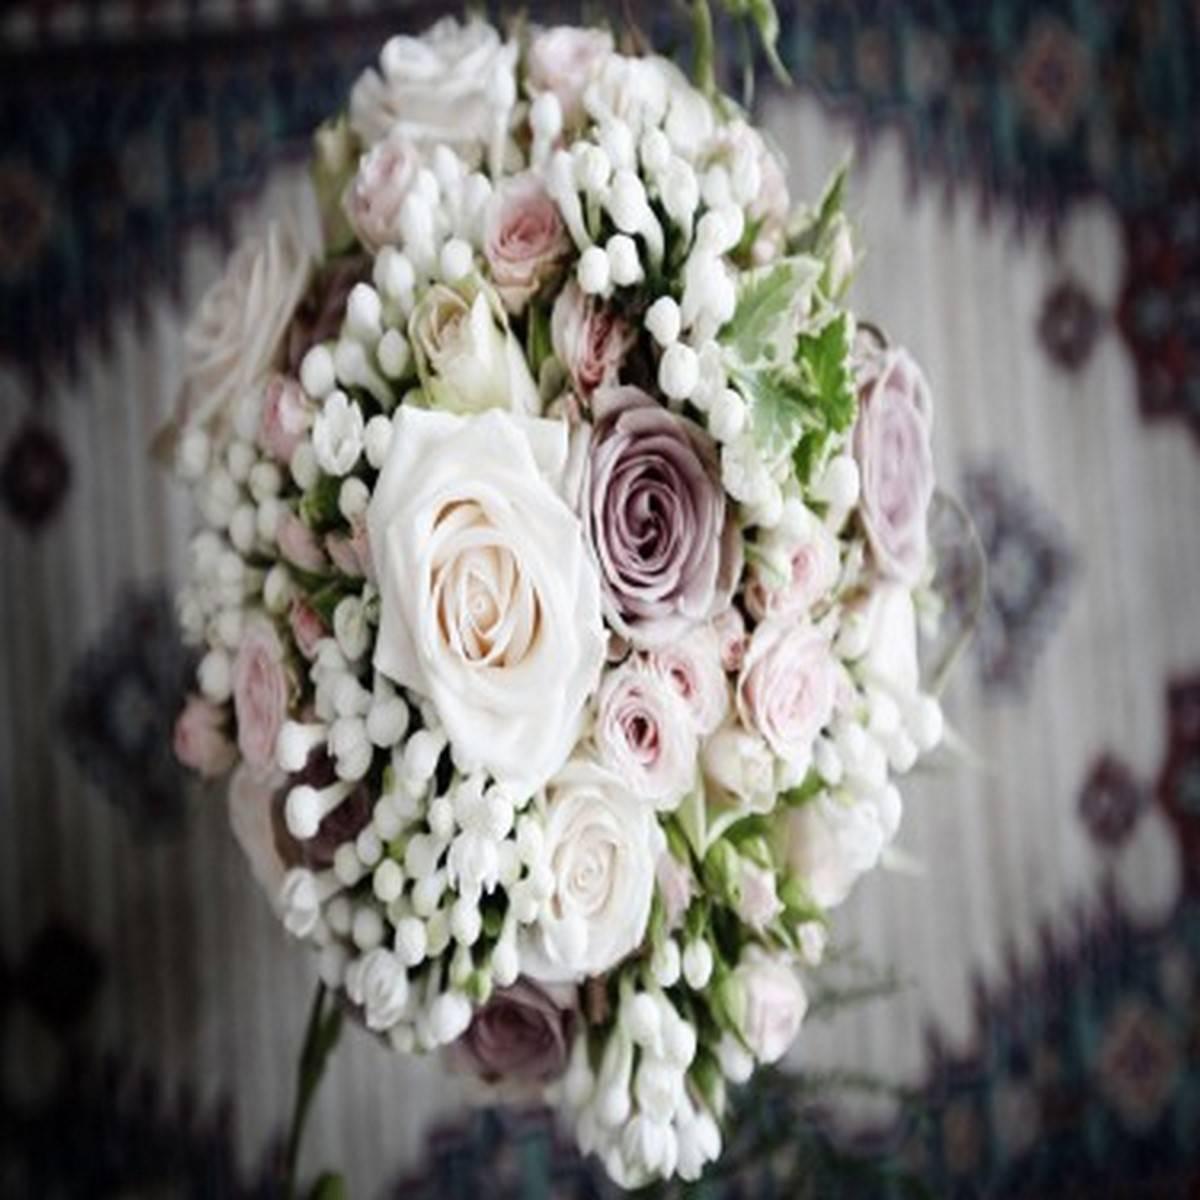 Matrimonio Country Chic Maison Mariage Wedding Planner : Wedding planner a padova venezia treviso maison mariage